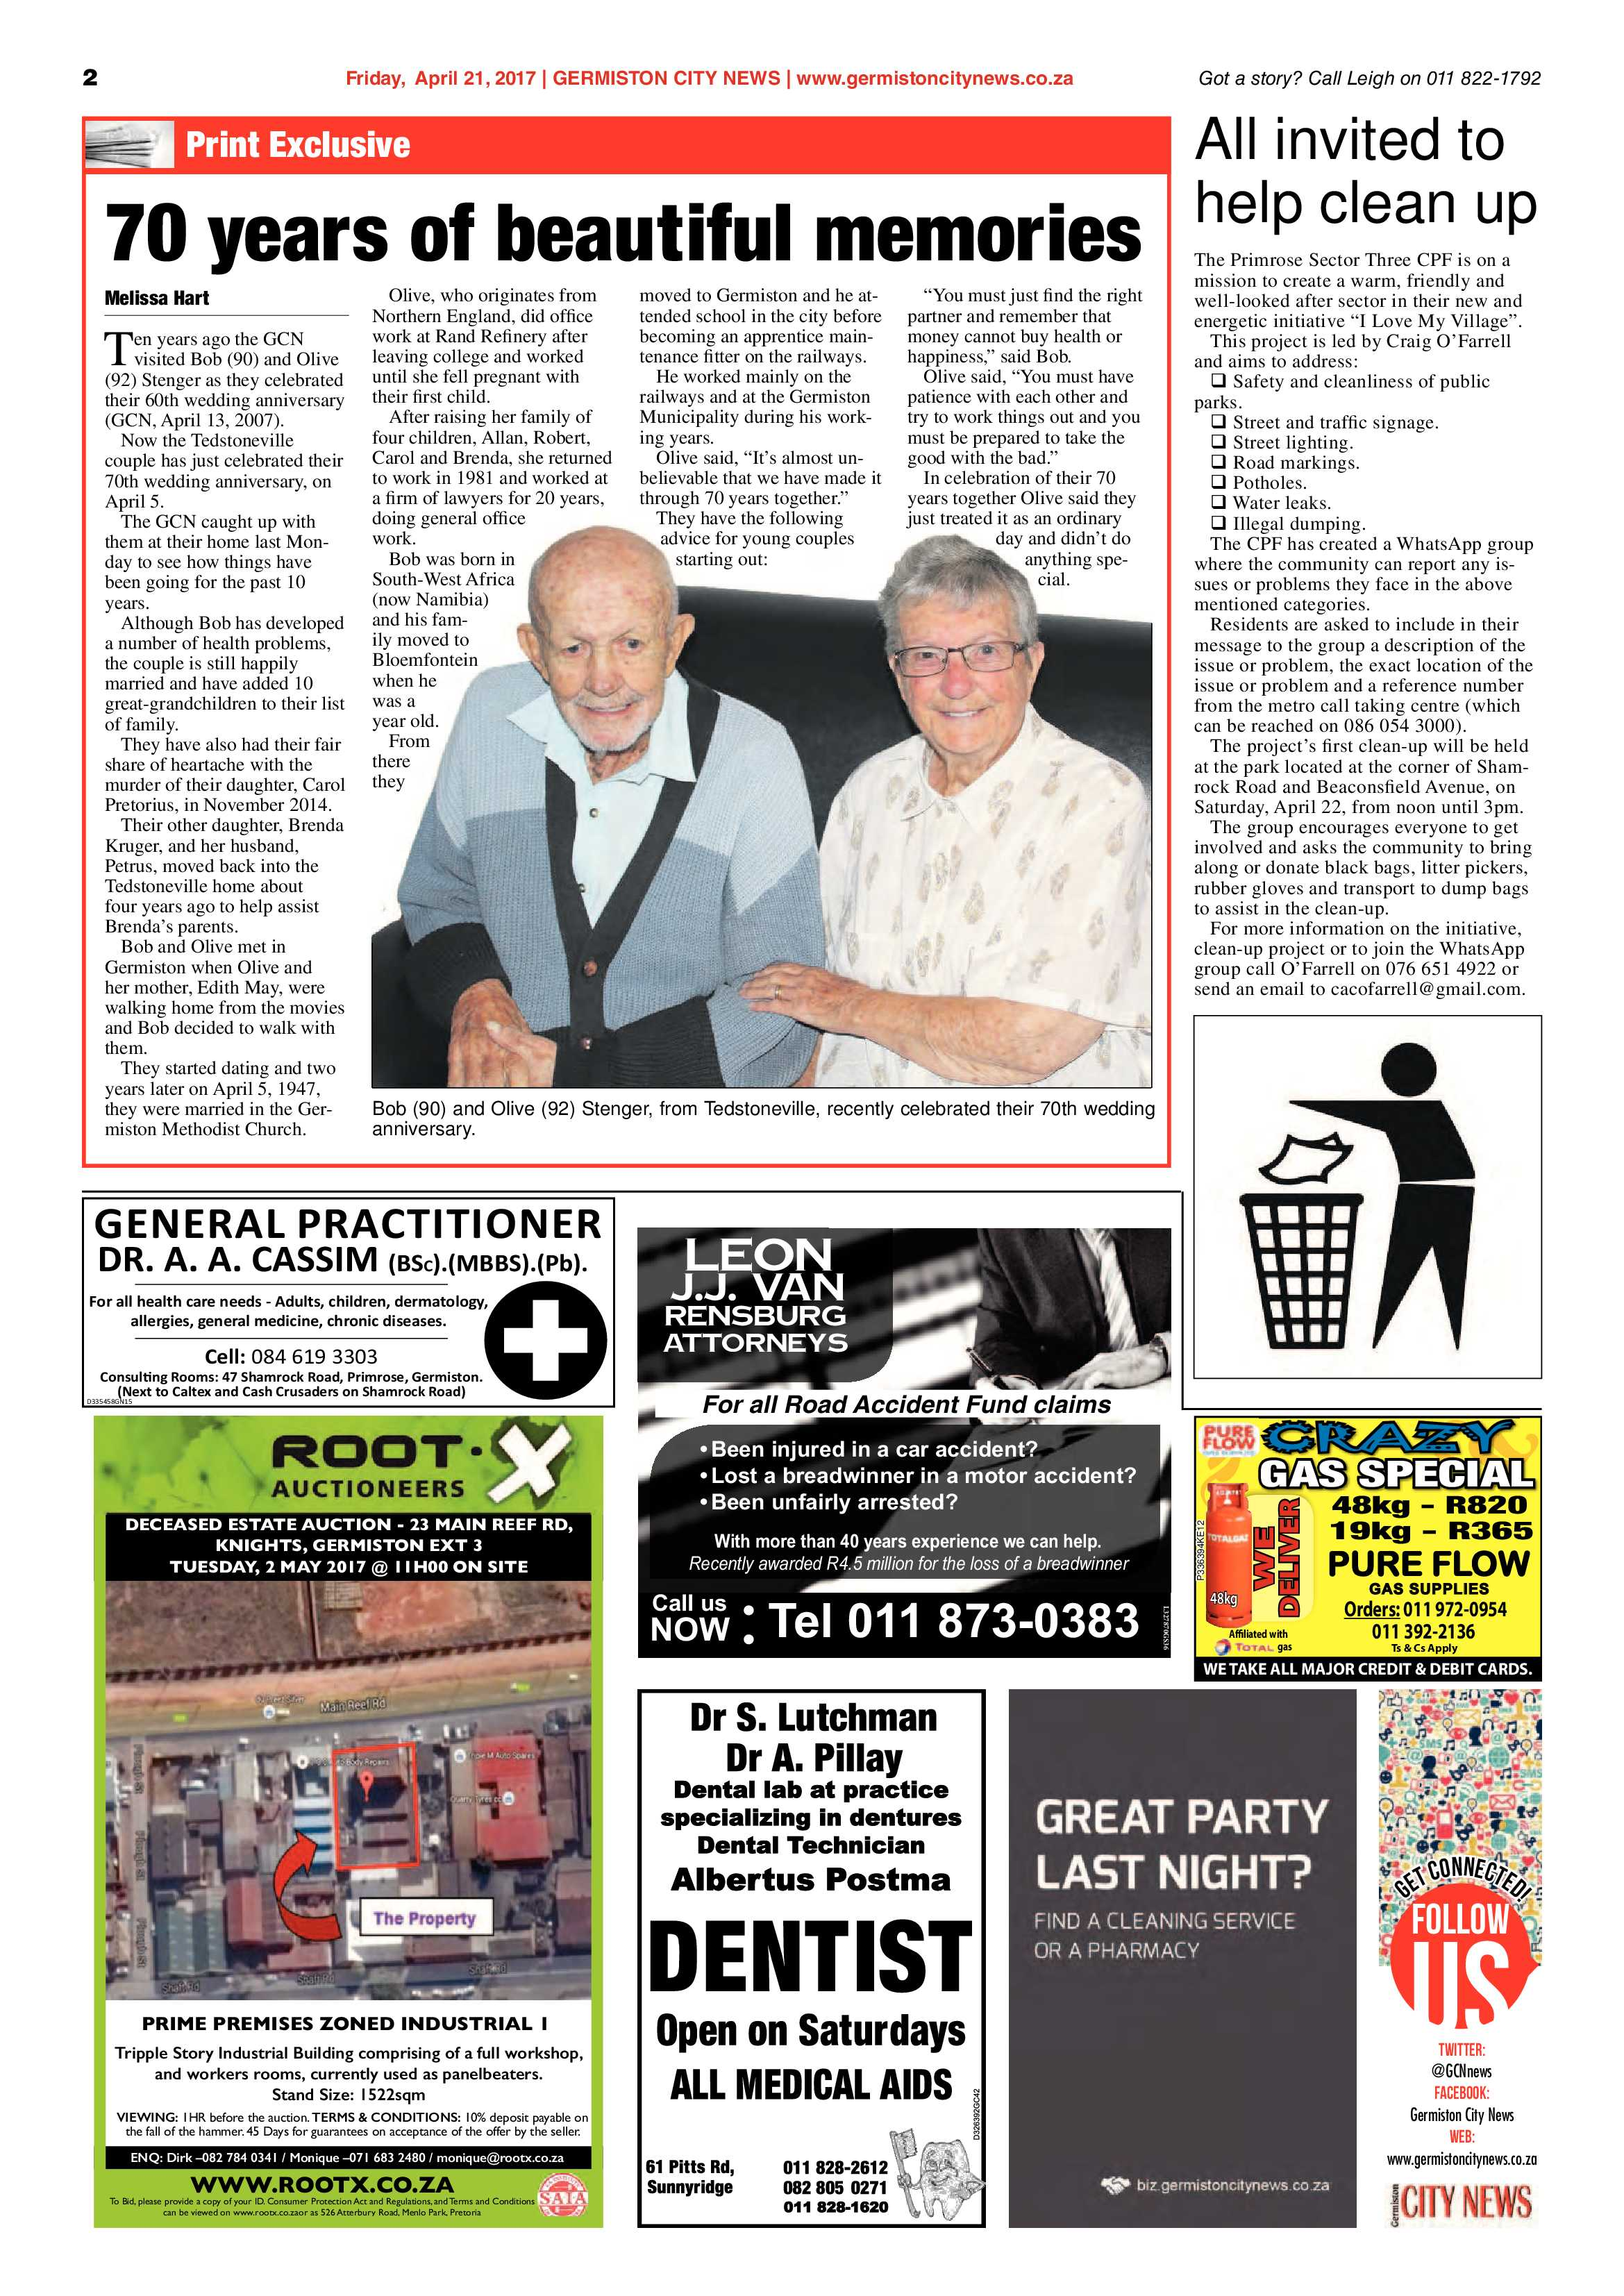 germiston-city-news-19-april-2017-epapers-page-2